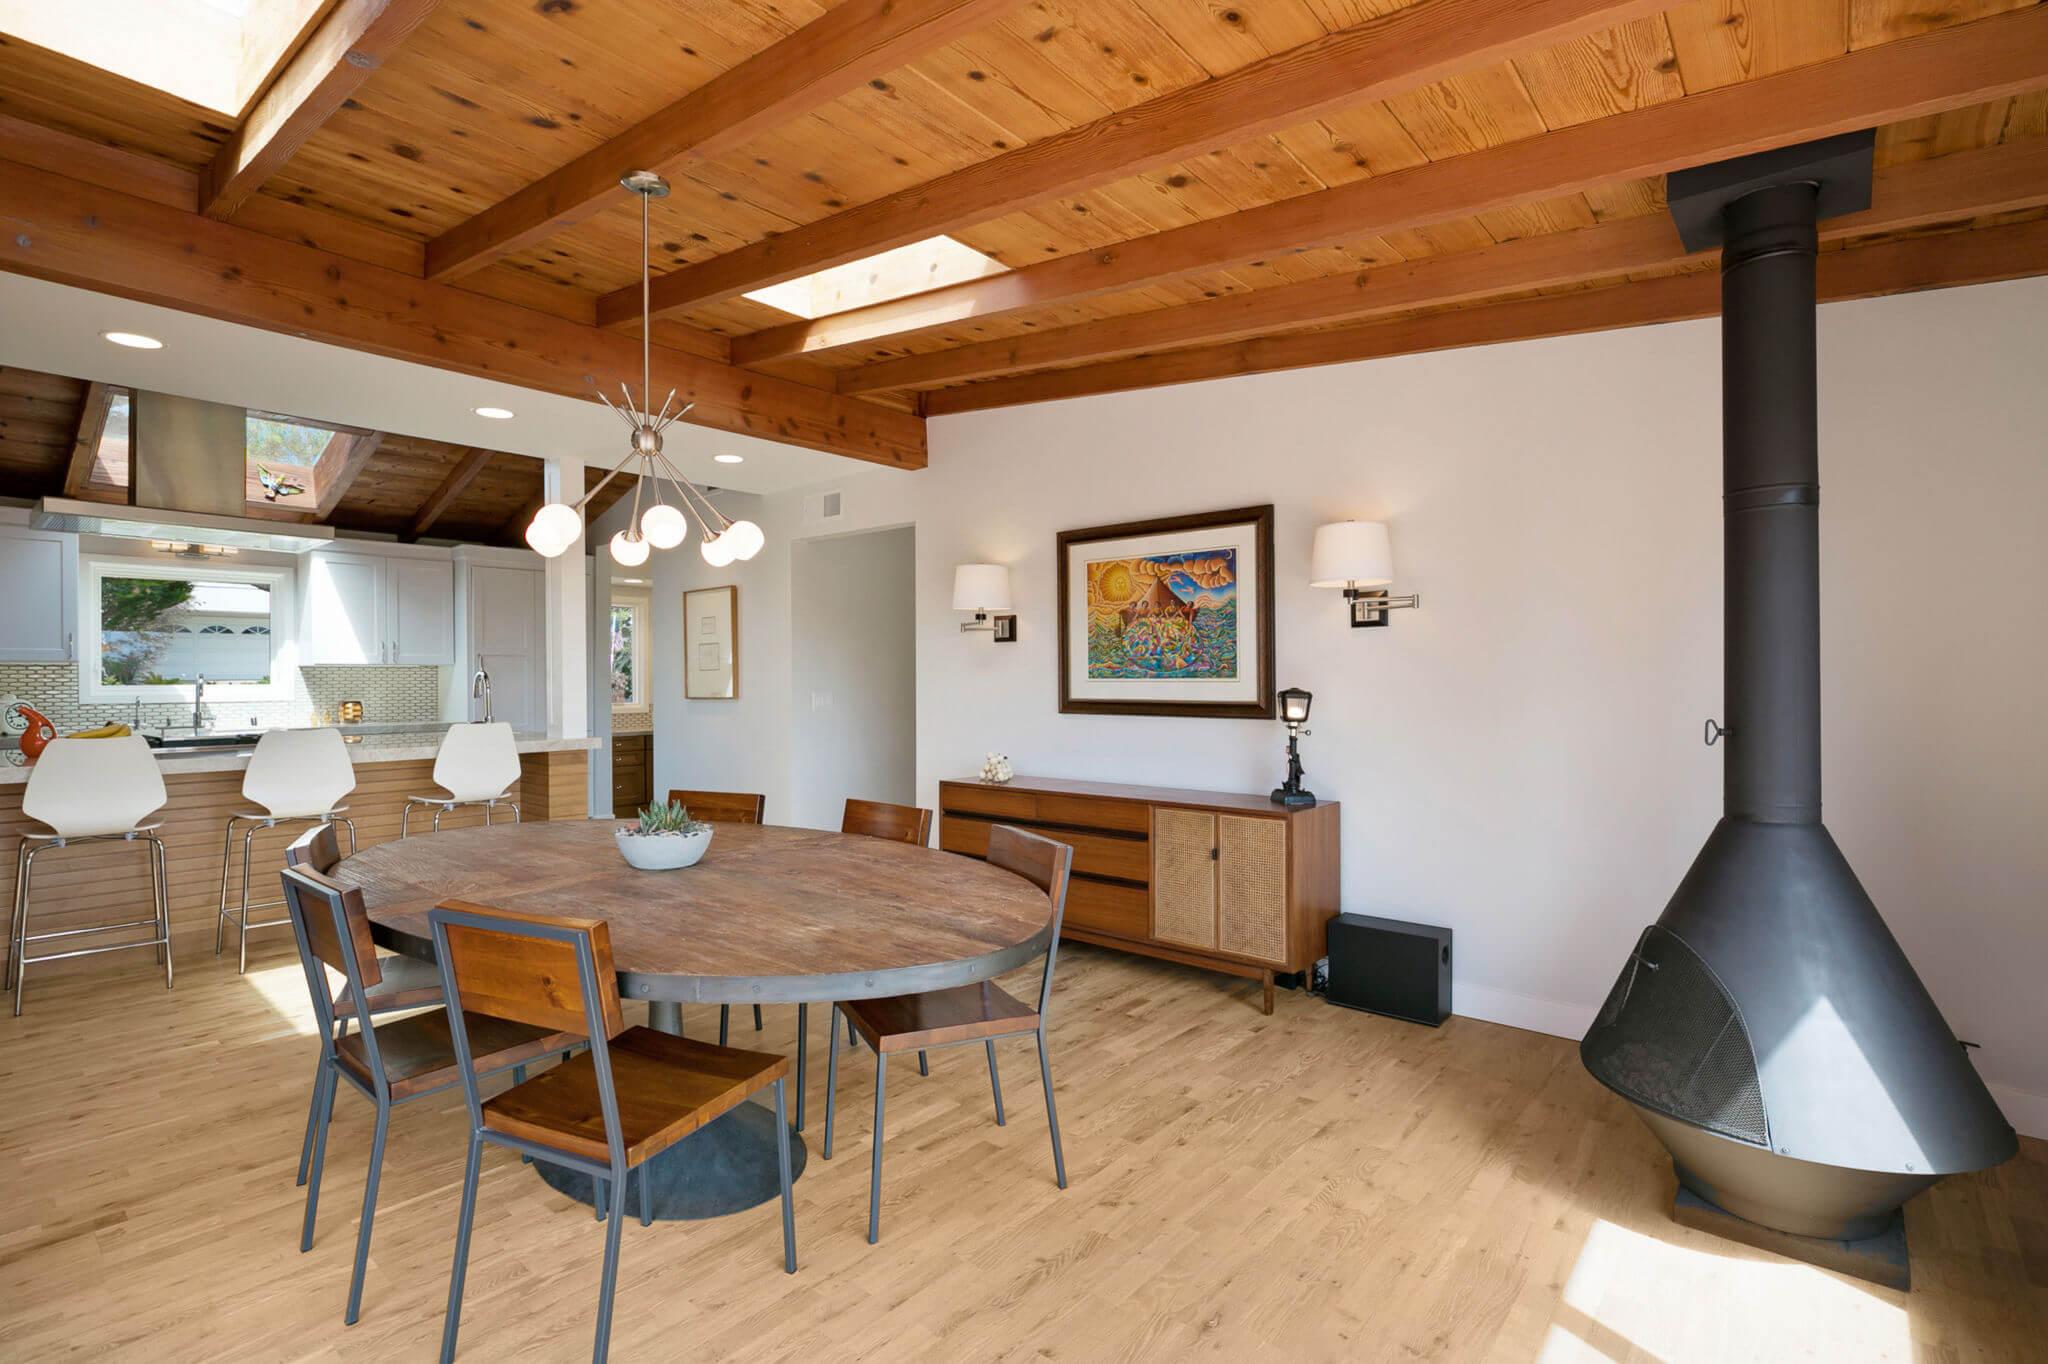 Kitchen Eating Area Remodel, Luxury Home Design San Clemente, Open Concept Living Design